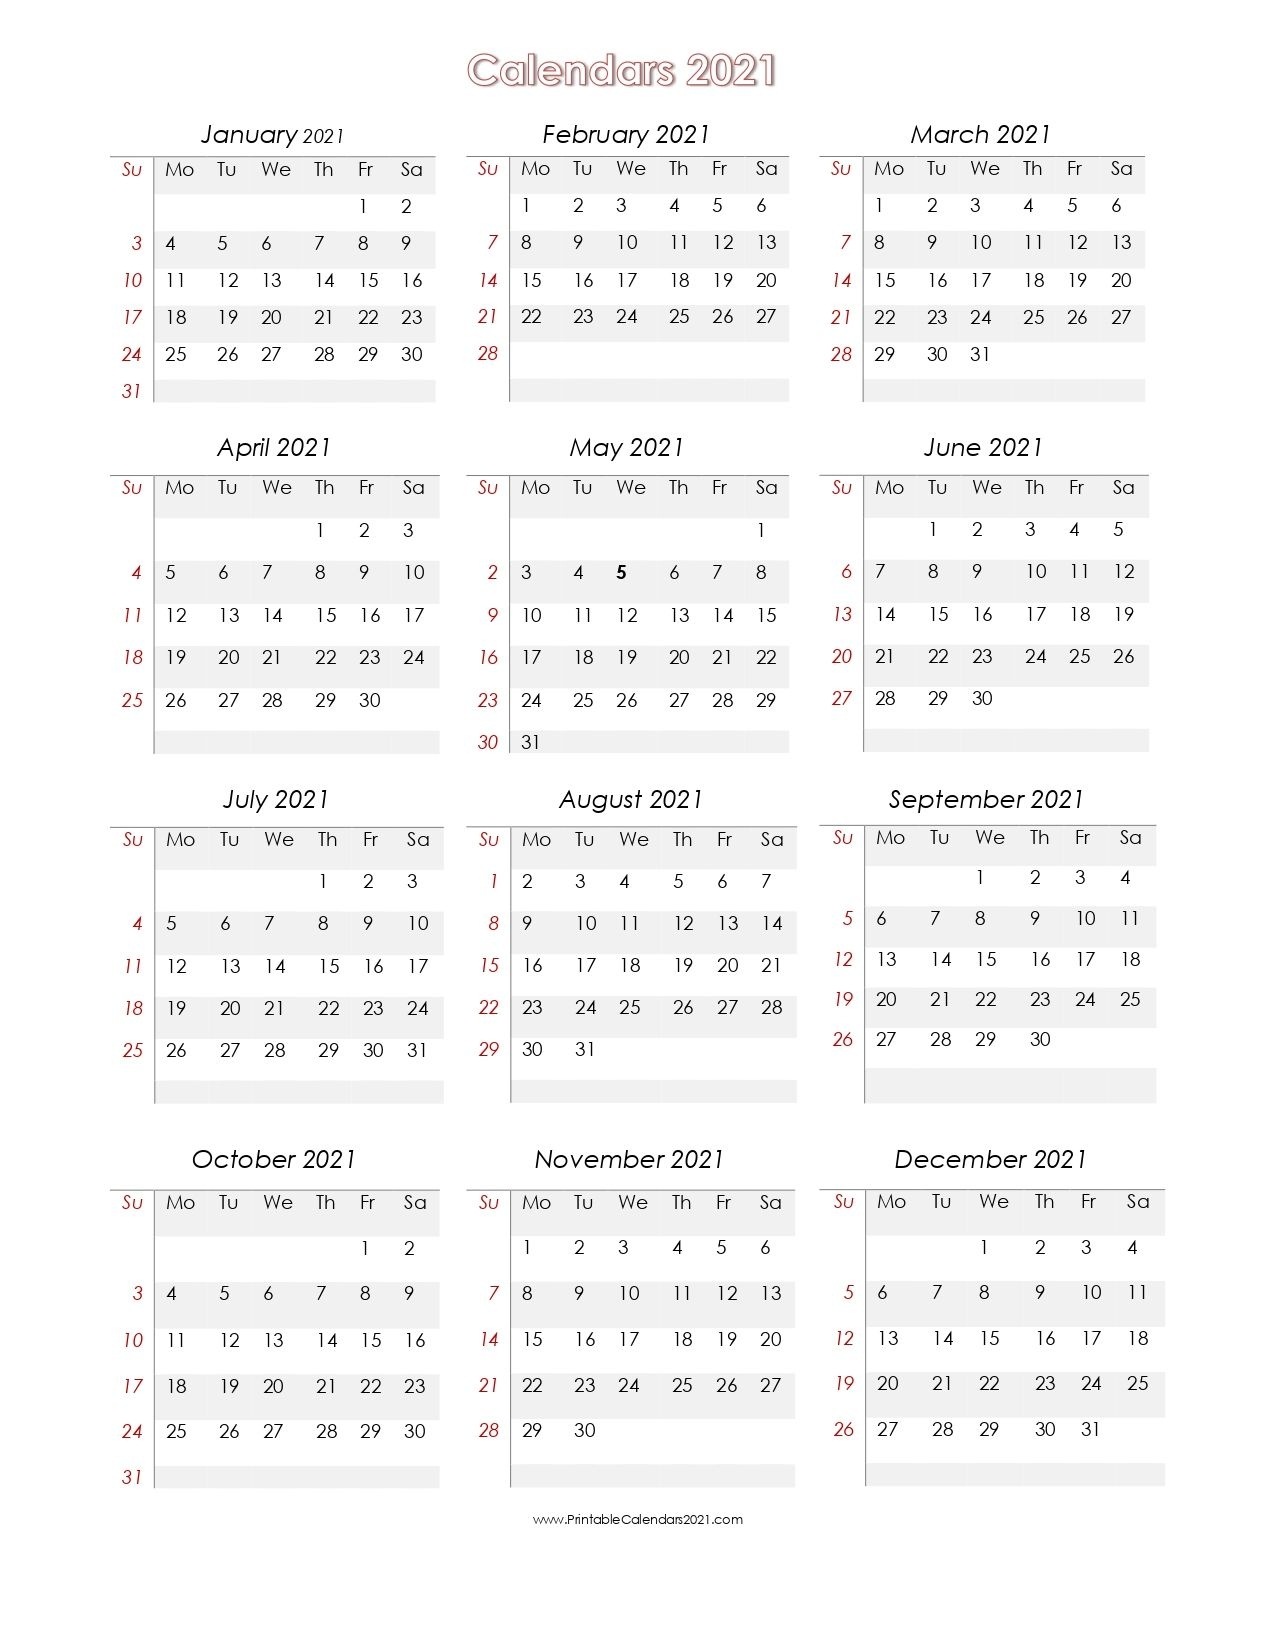 56 Printable Calendar 2021 One Page, Printable 2021 Yearly